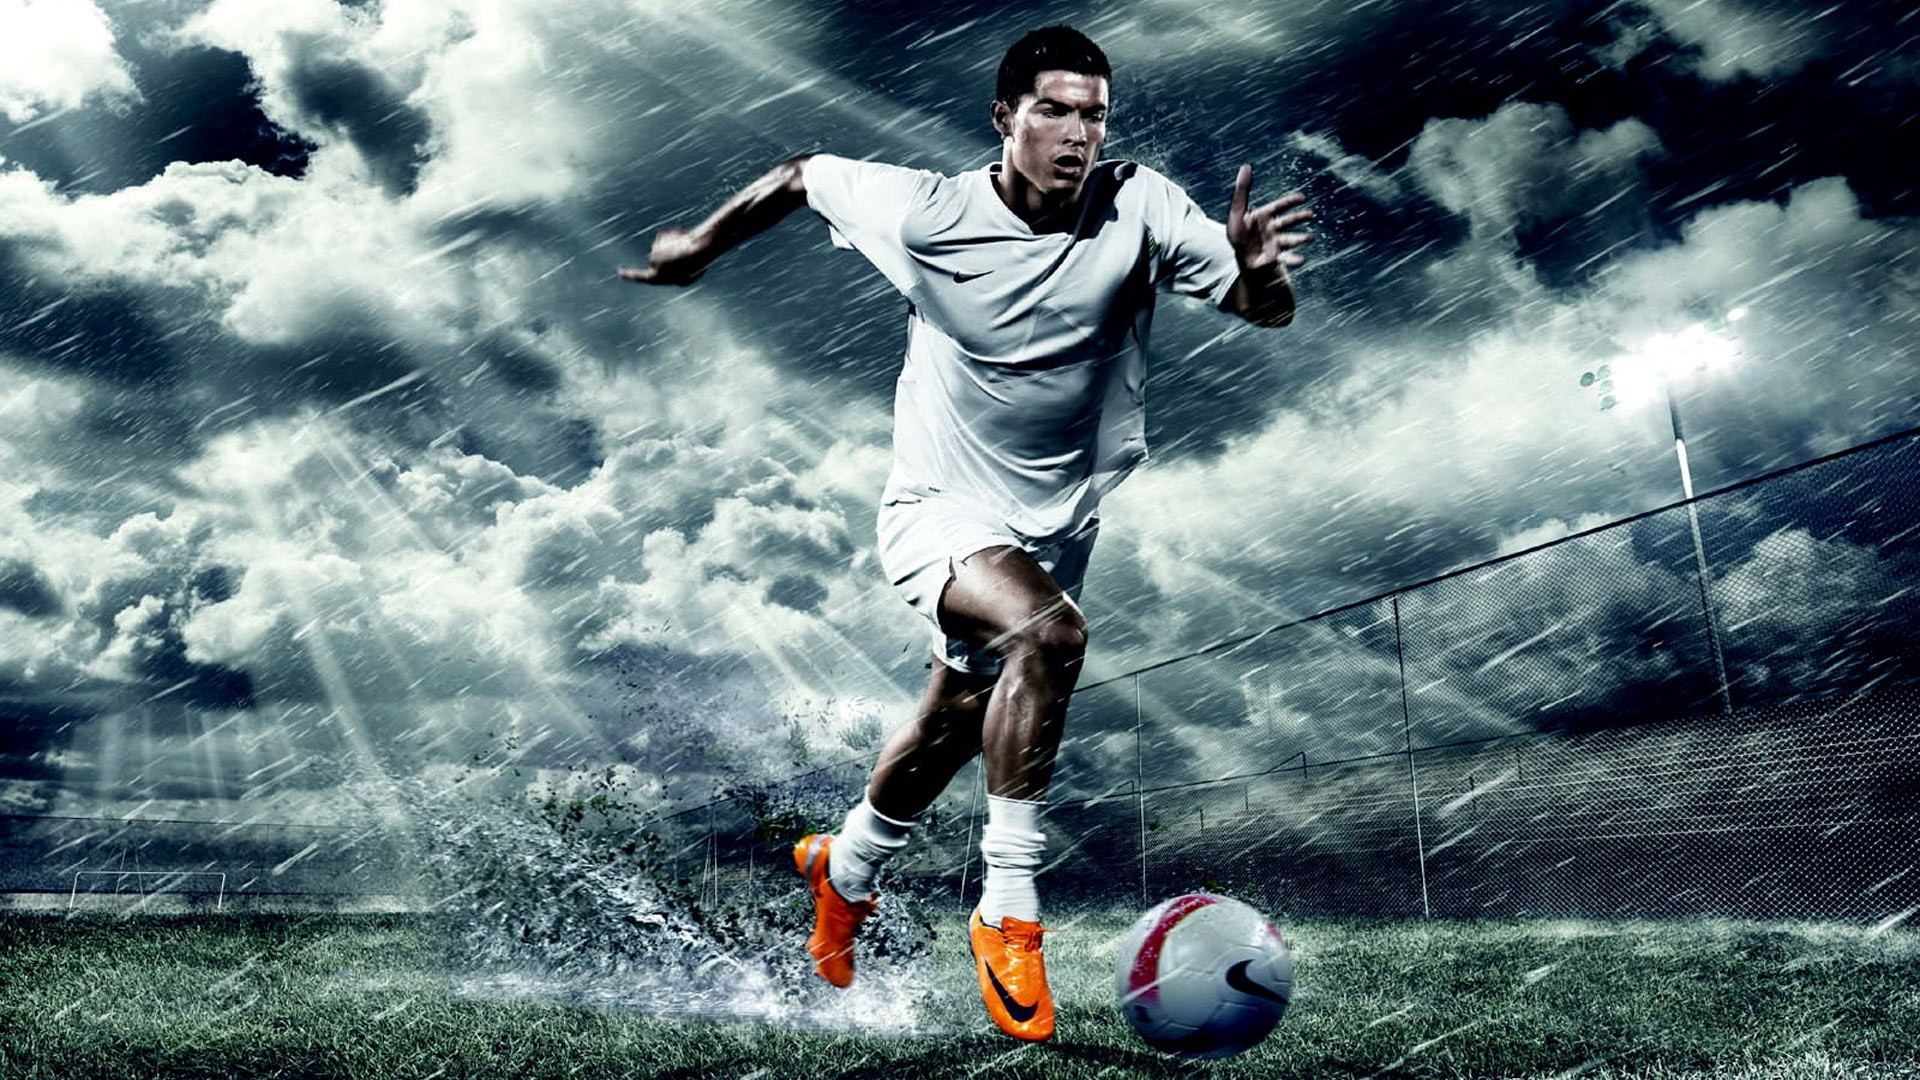 Hình nền cầu thủ cristiano ronaldo